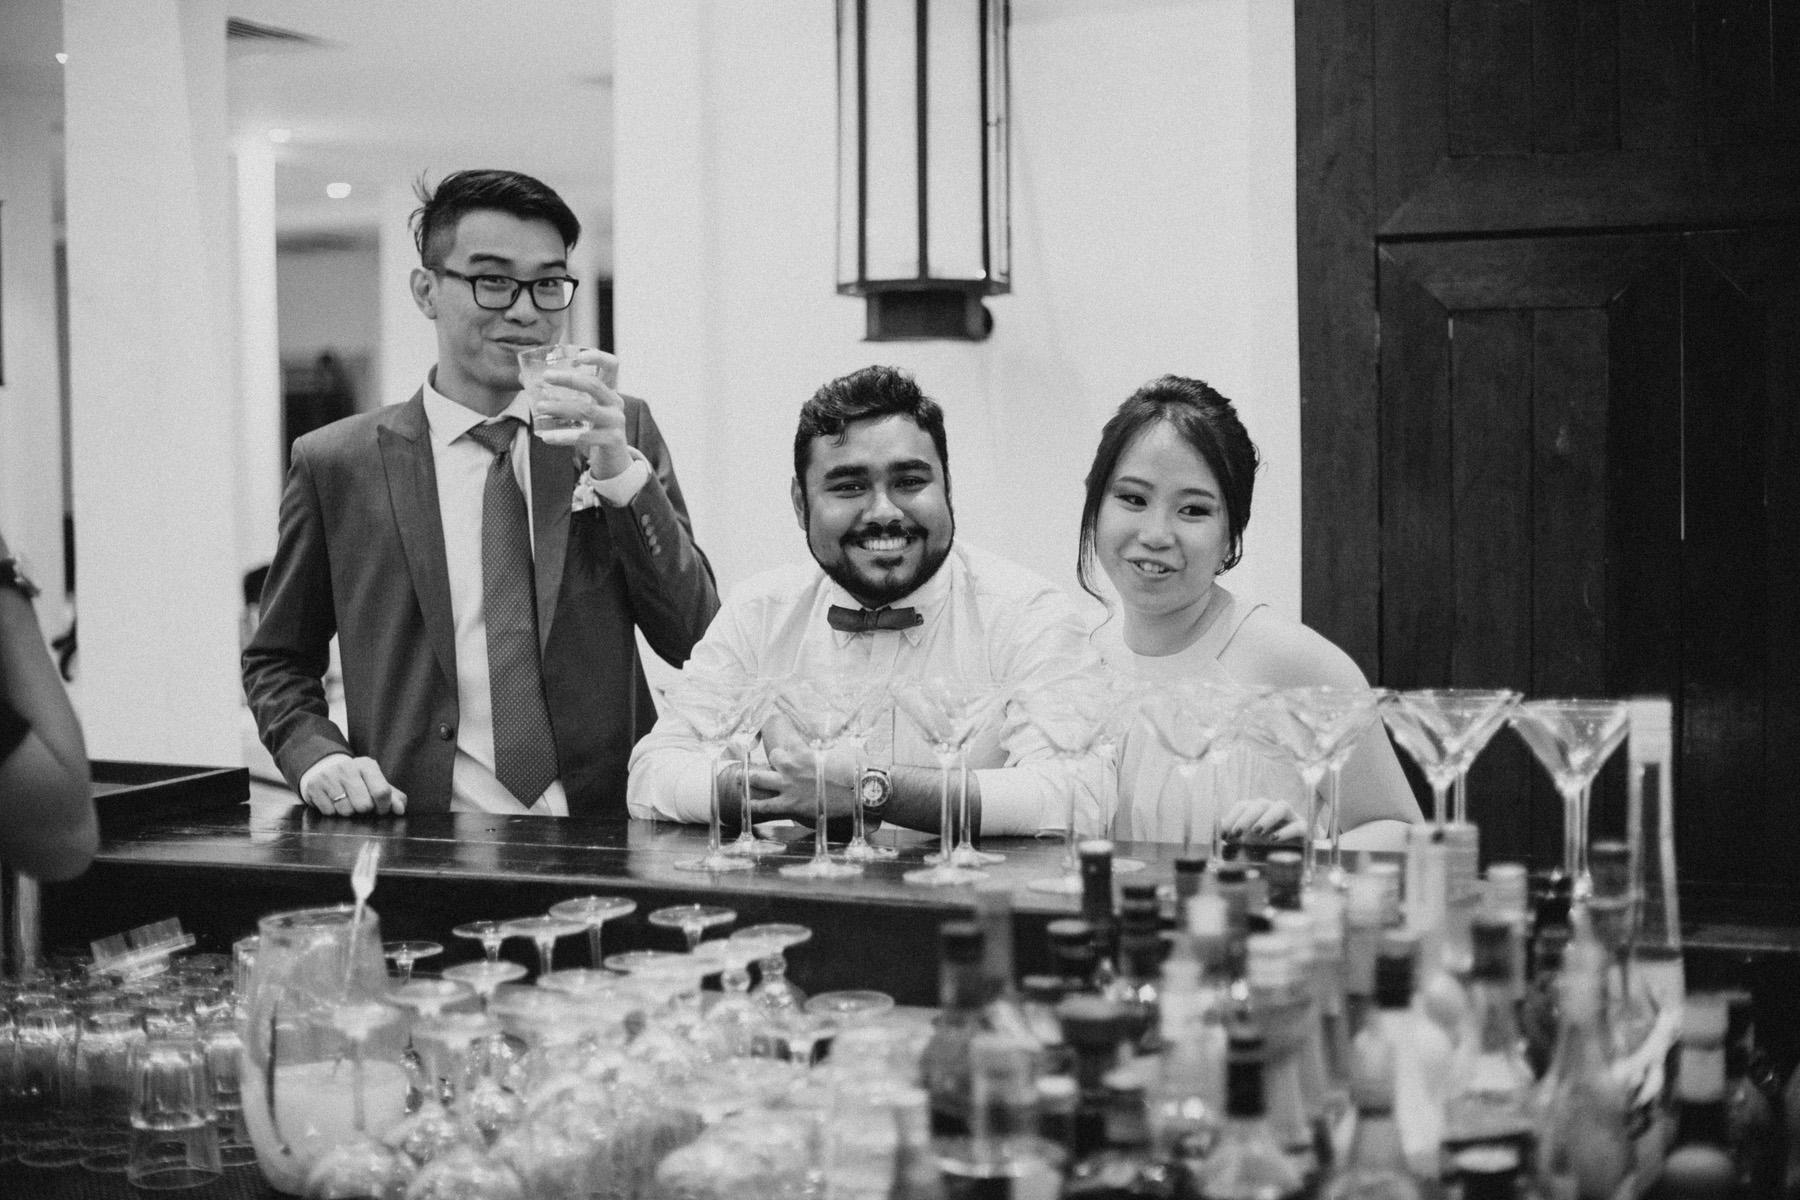 singapore-wedding-travel-photographer-faith-alvin-wedding-wmt-52.jpg